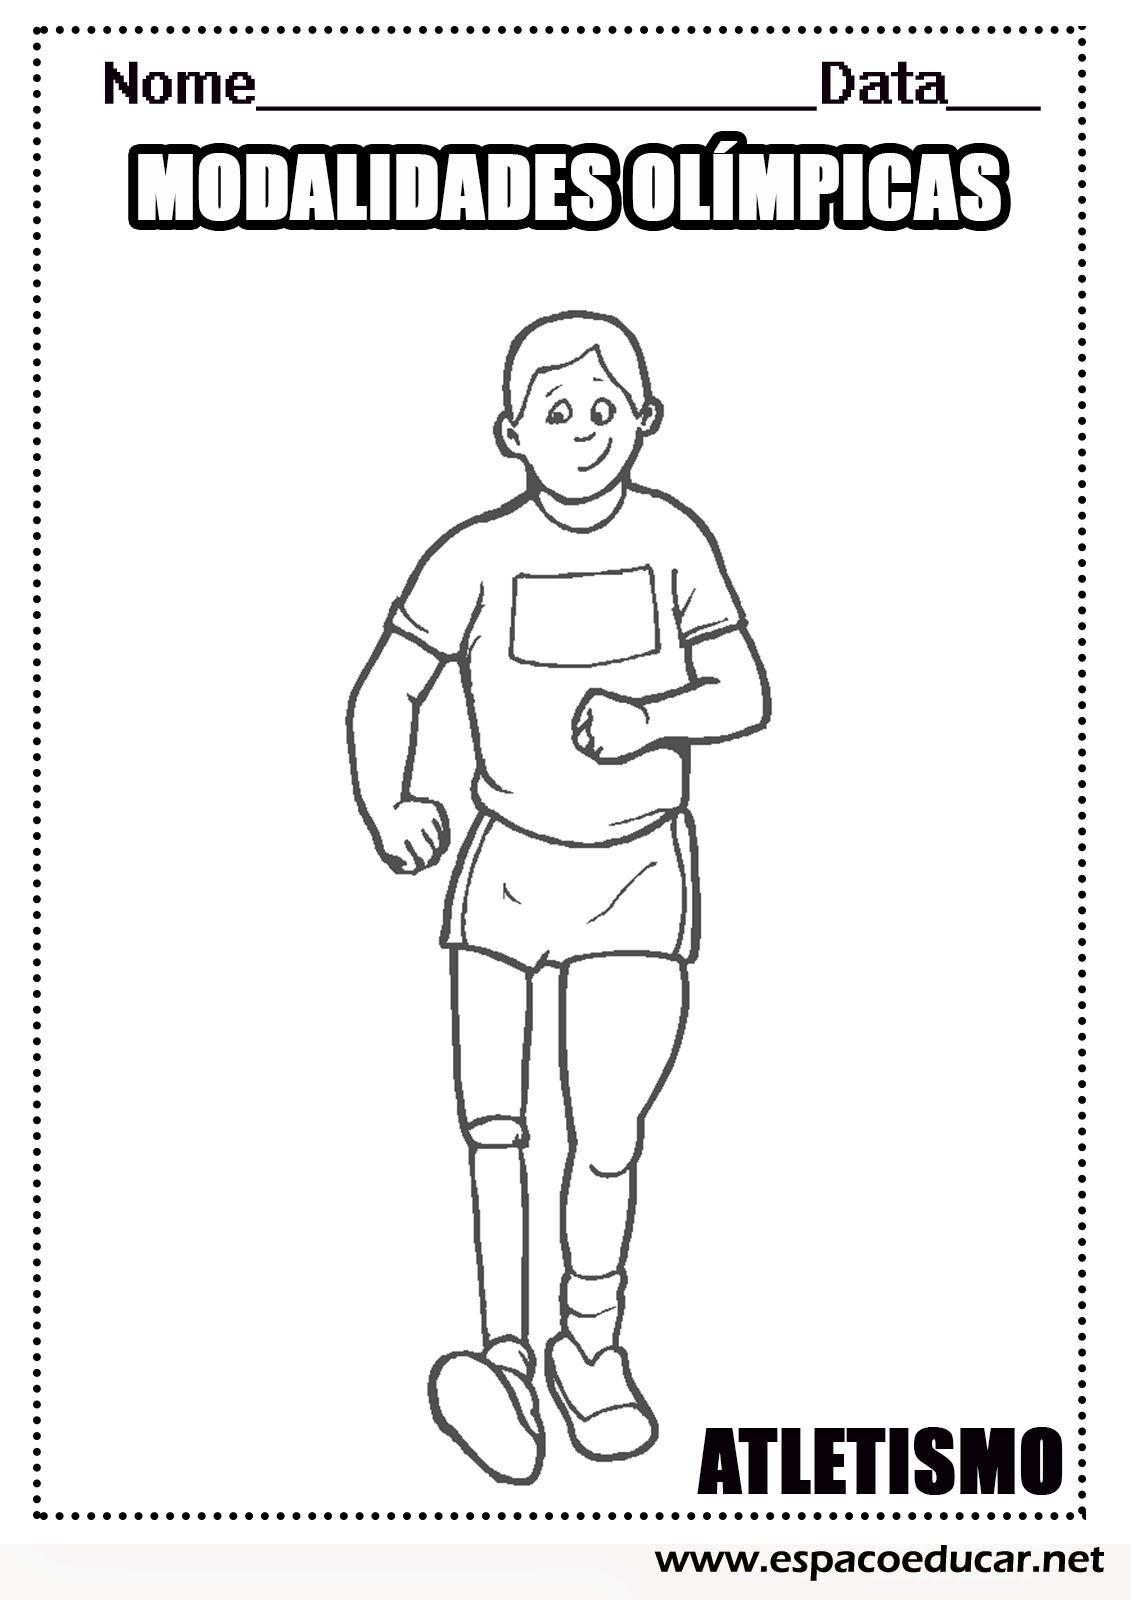 Desenhos Das Modalidades Esportivas Das Olimpiadas Para Colorir